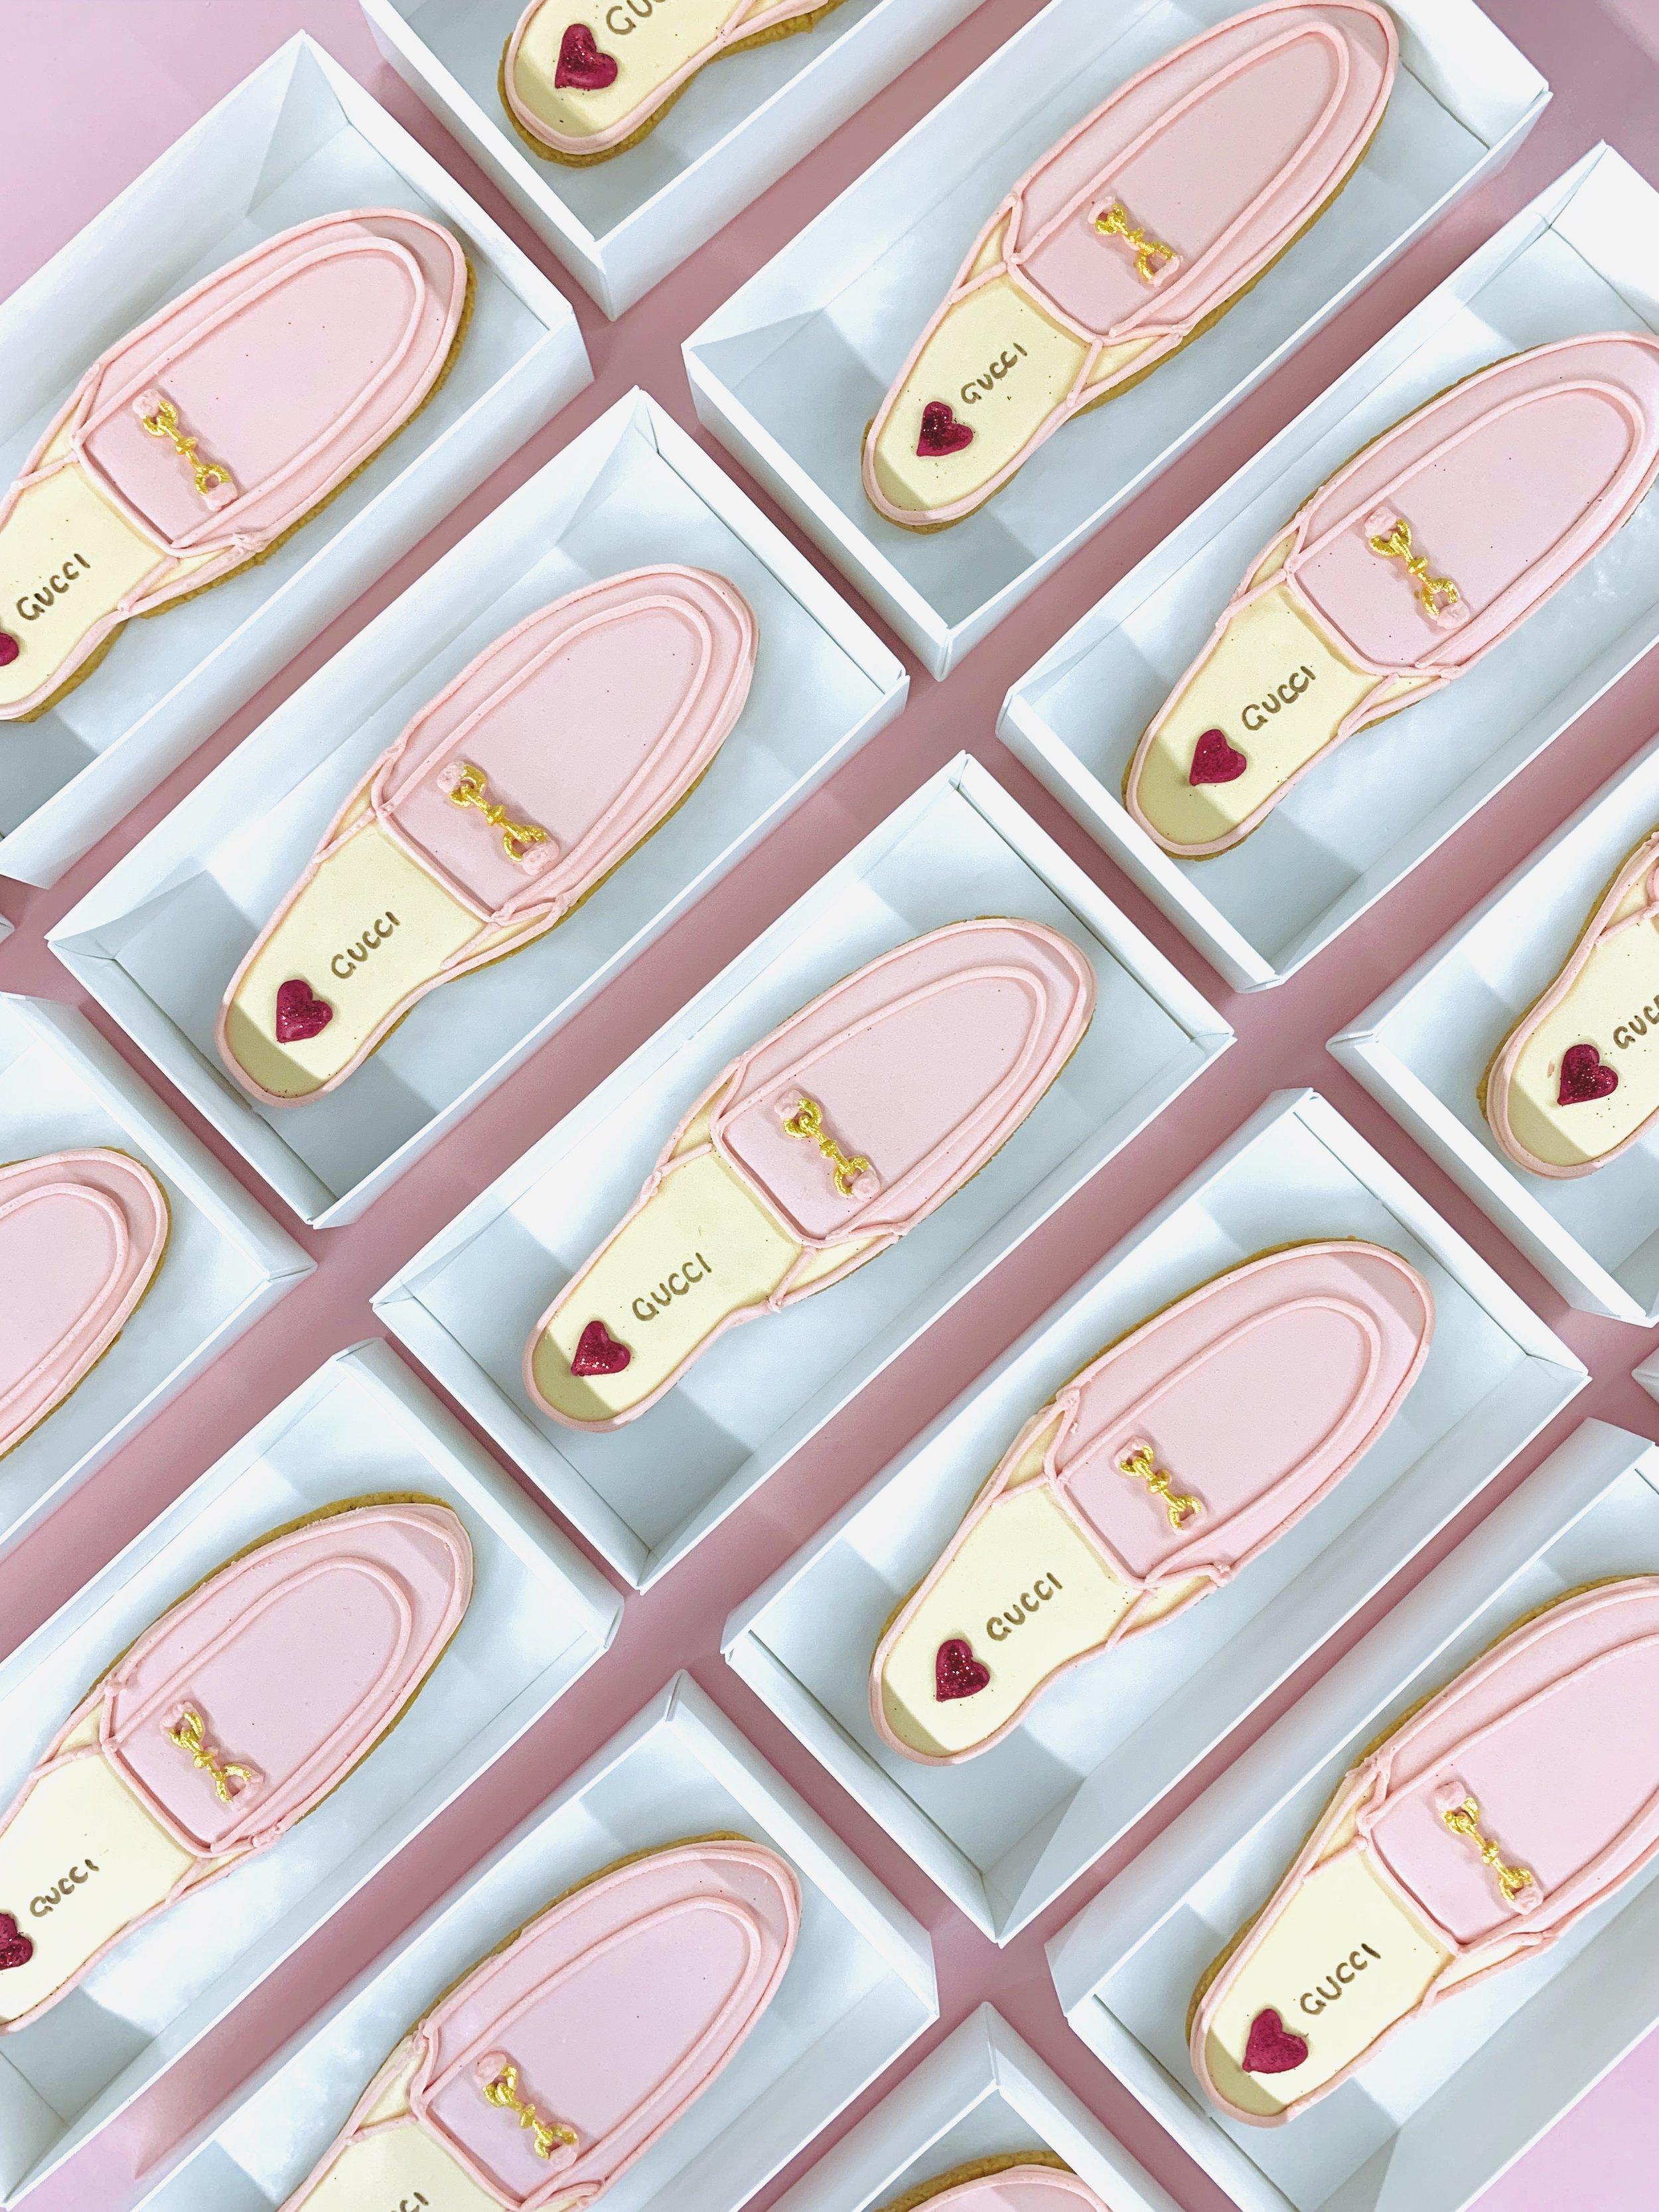 Gucci shoe cookies.jpg